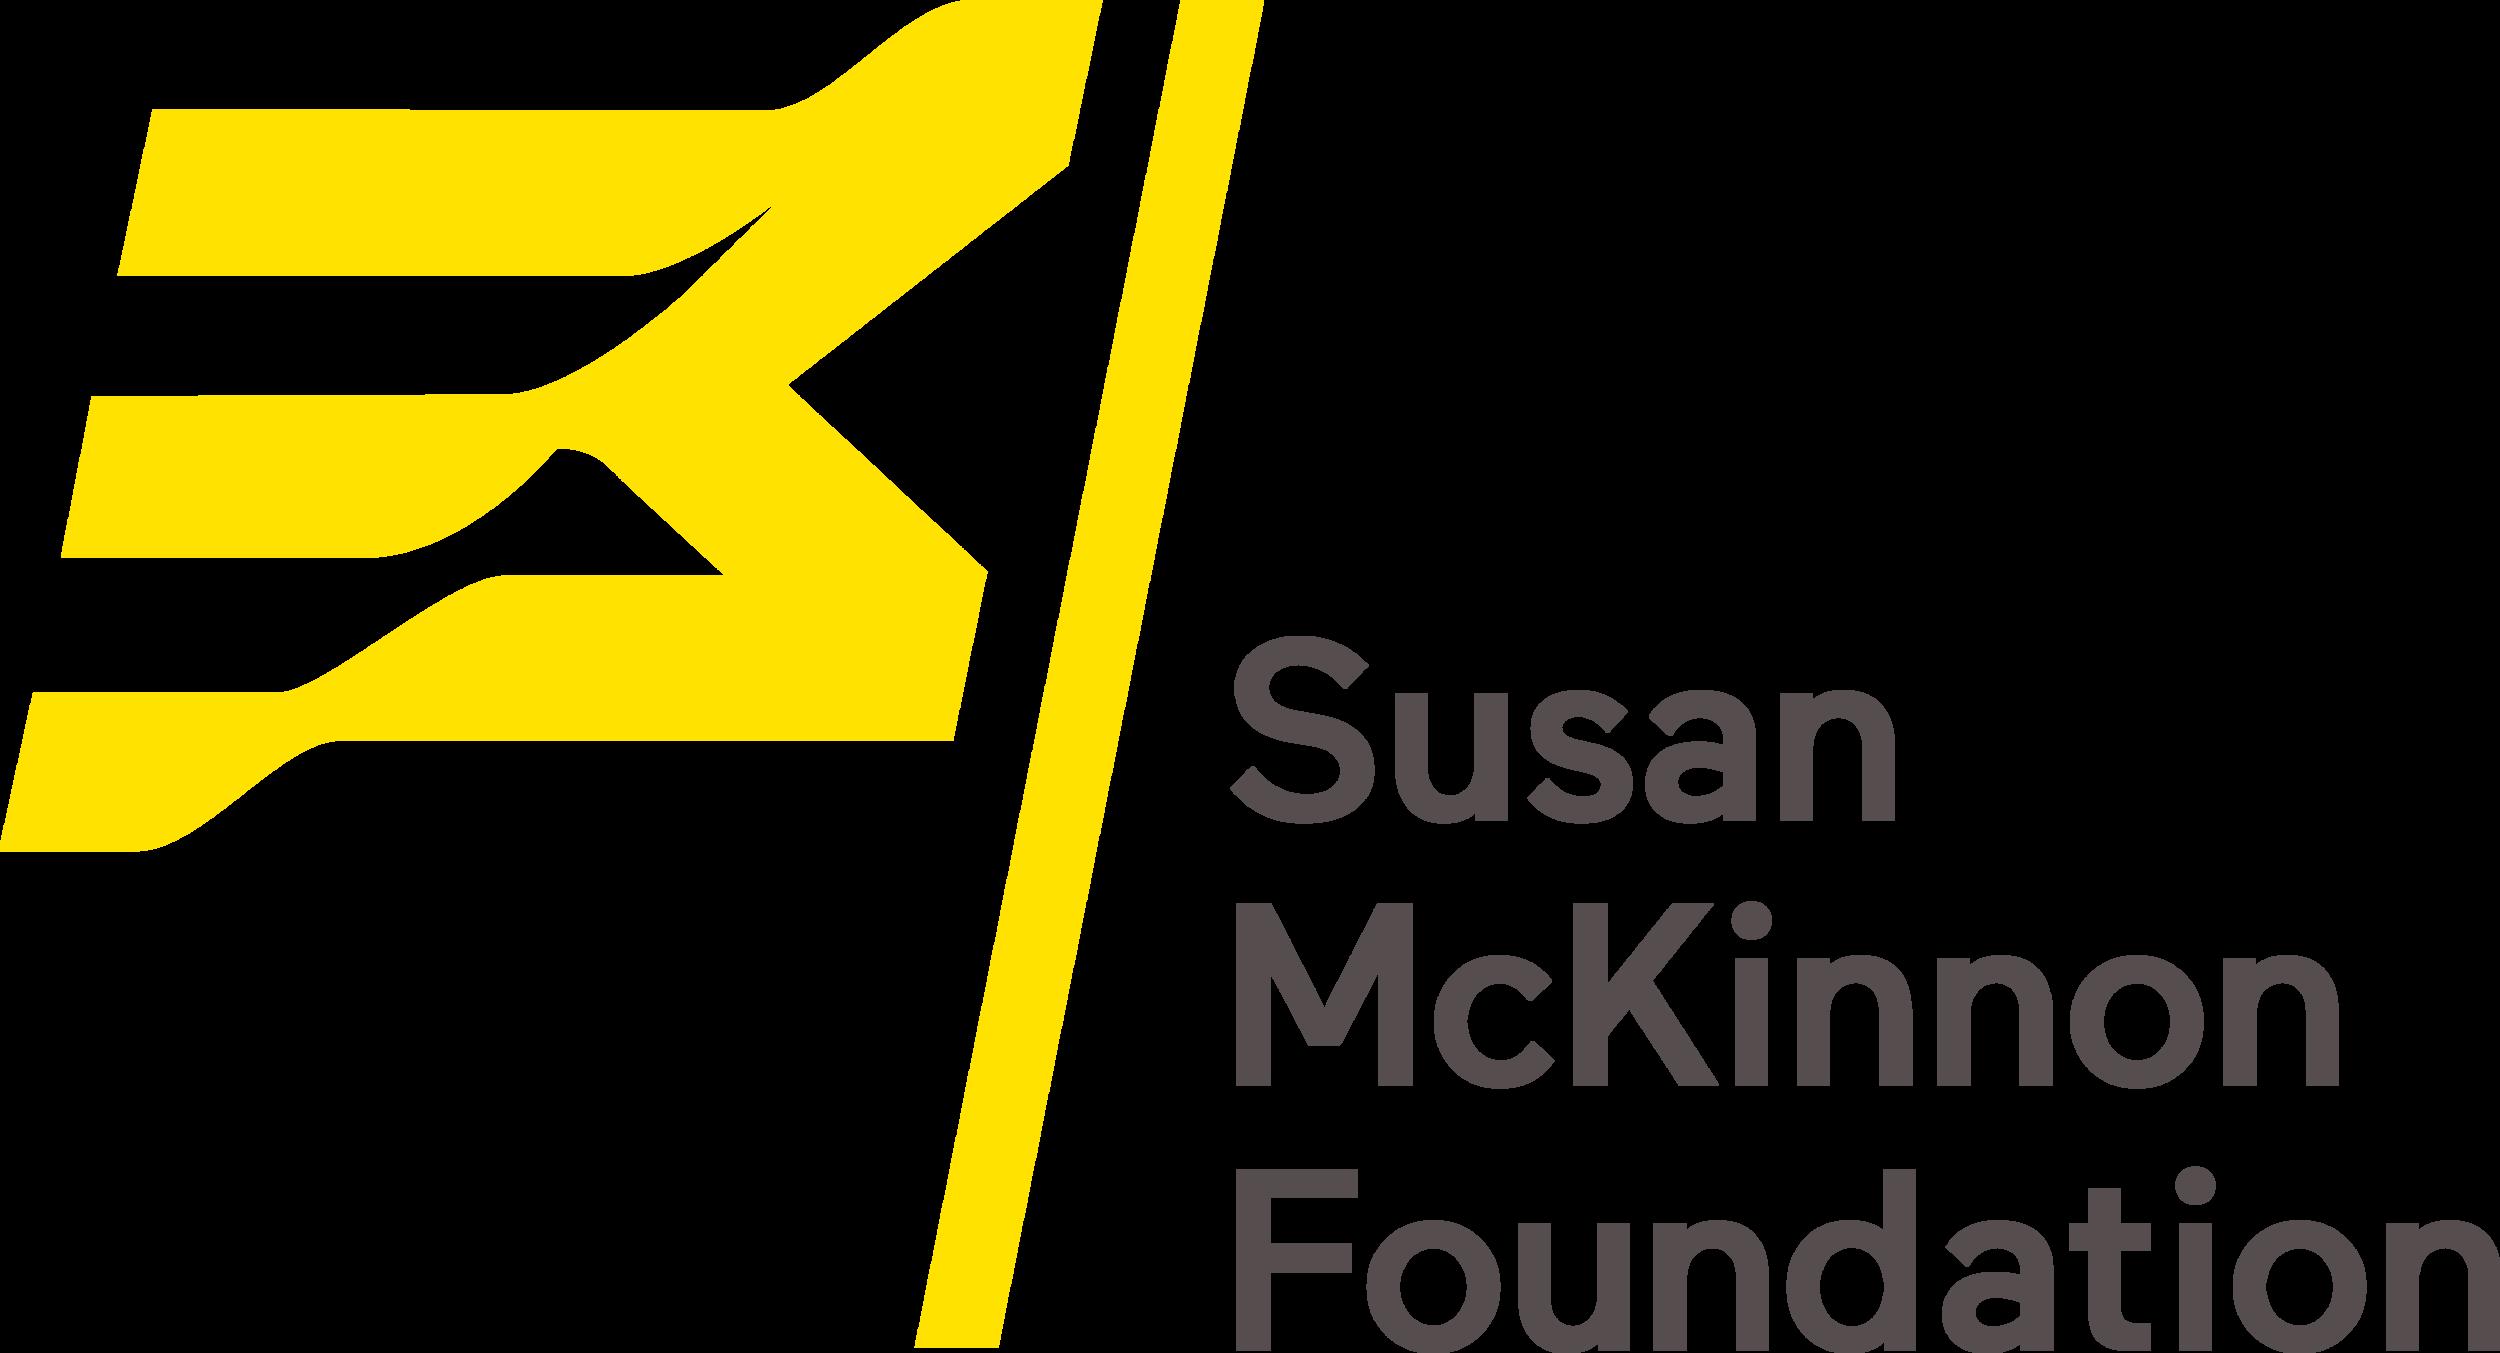 Susan McKinnon Foundation Brandmark RGB Charcoal.png